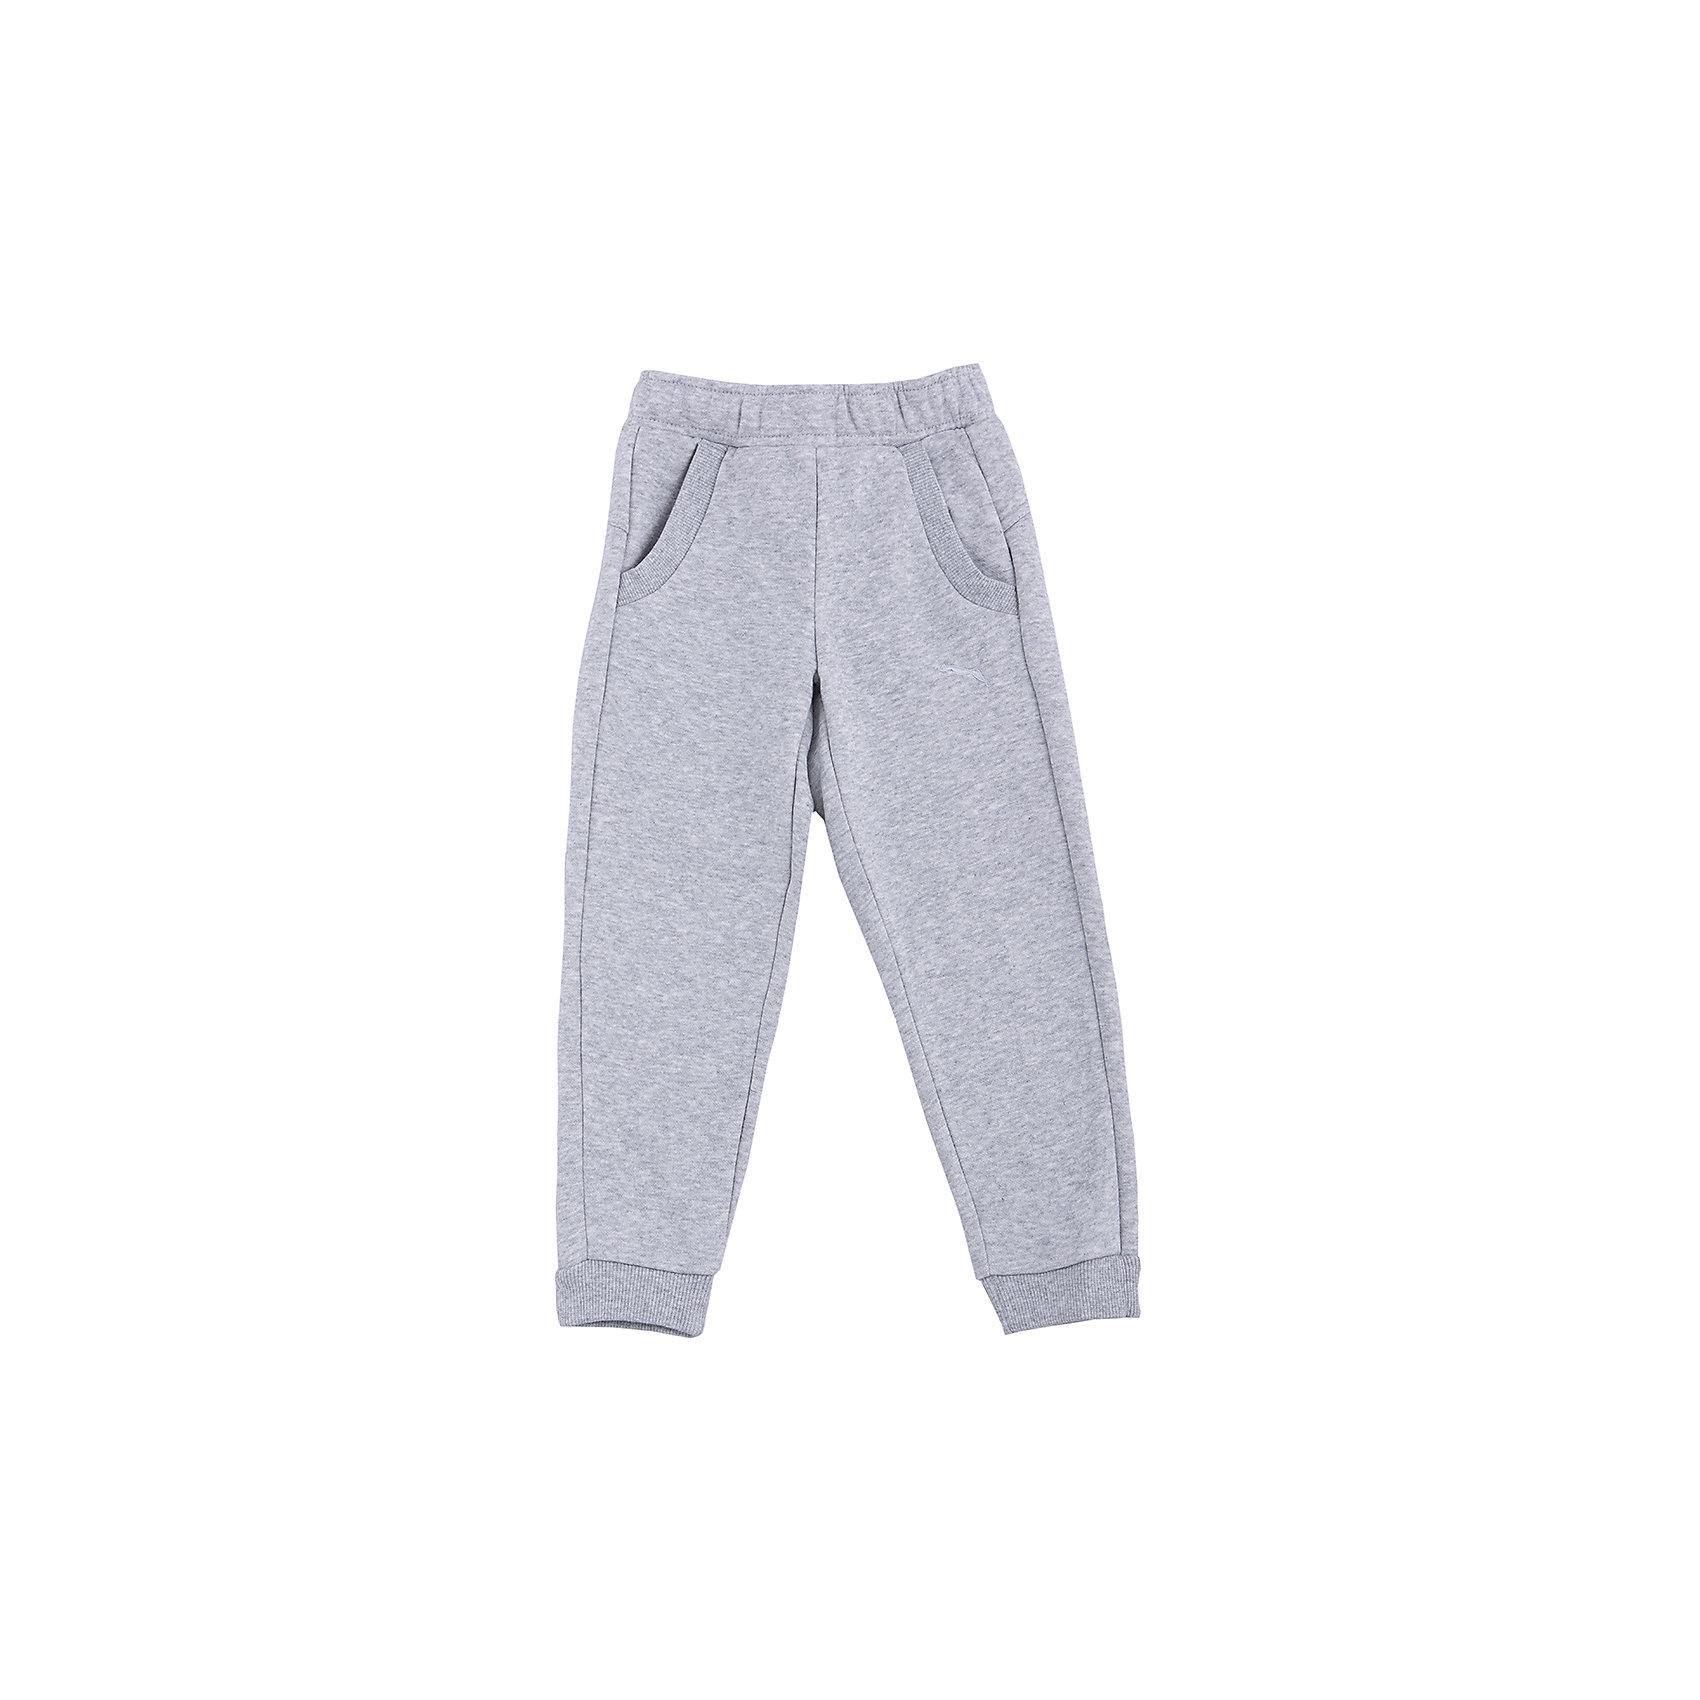 Брюки для девочки FUN TD Sweat Pants PUMA